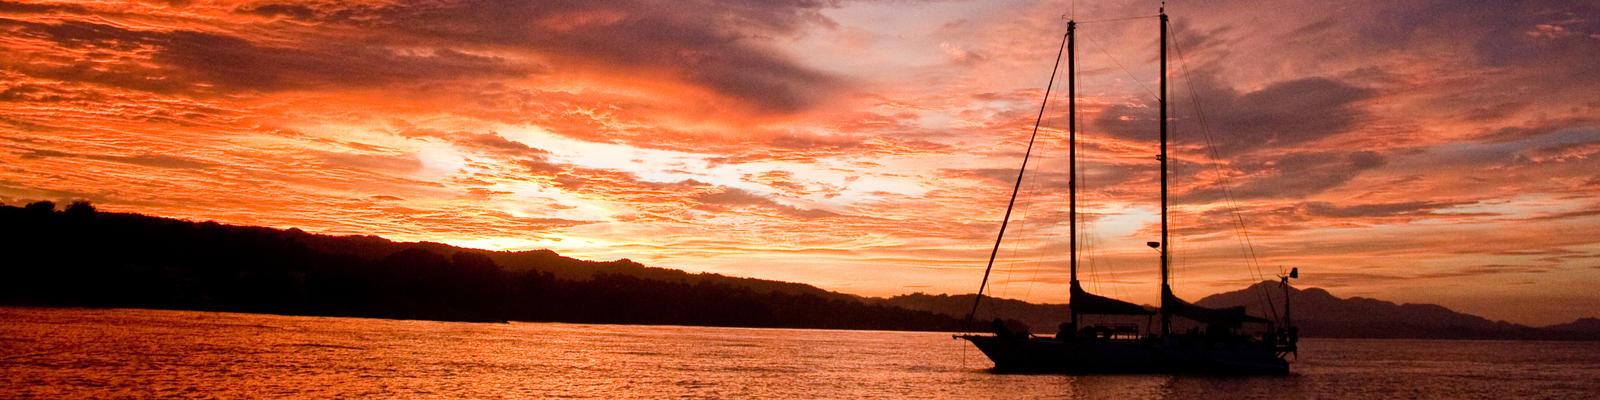 Solomon Islands at sunset (Photo: Marci Paravia/Shutterstock.com)